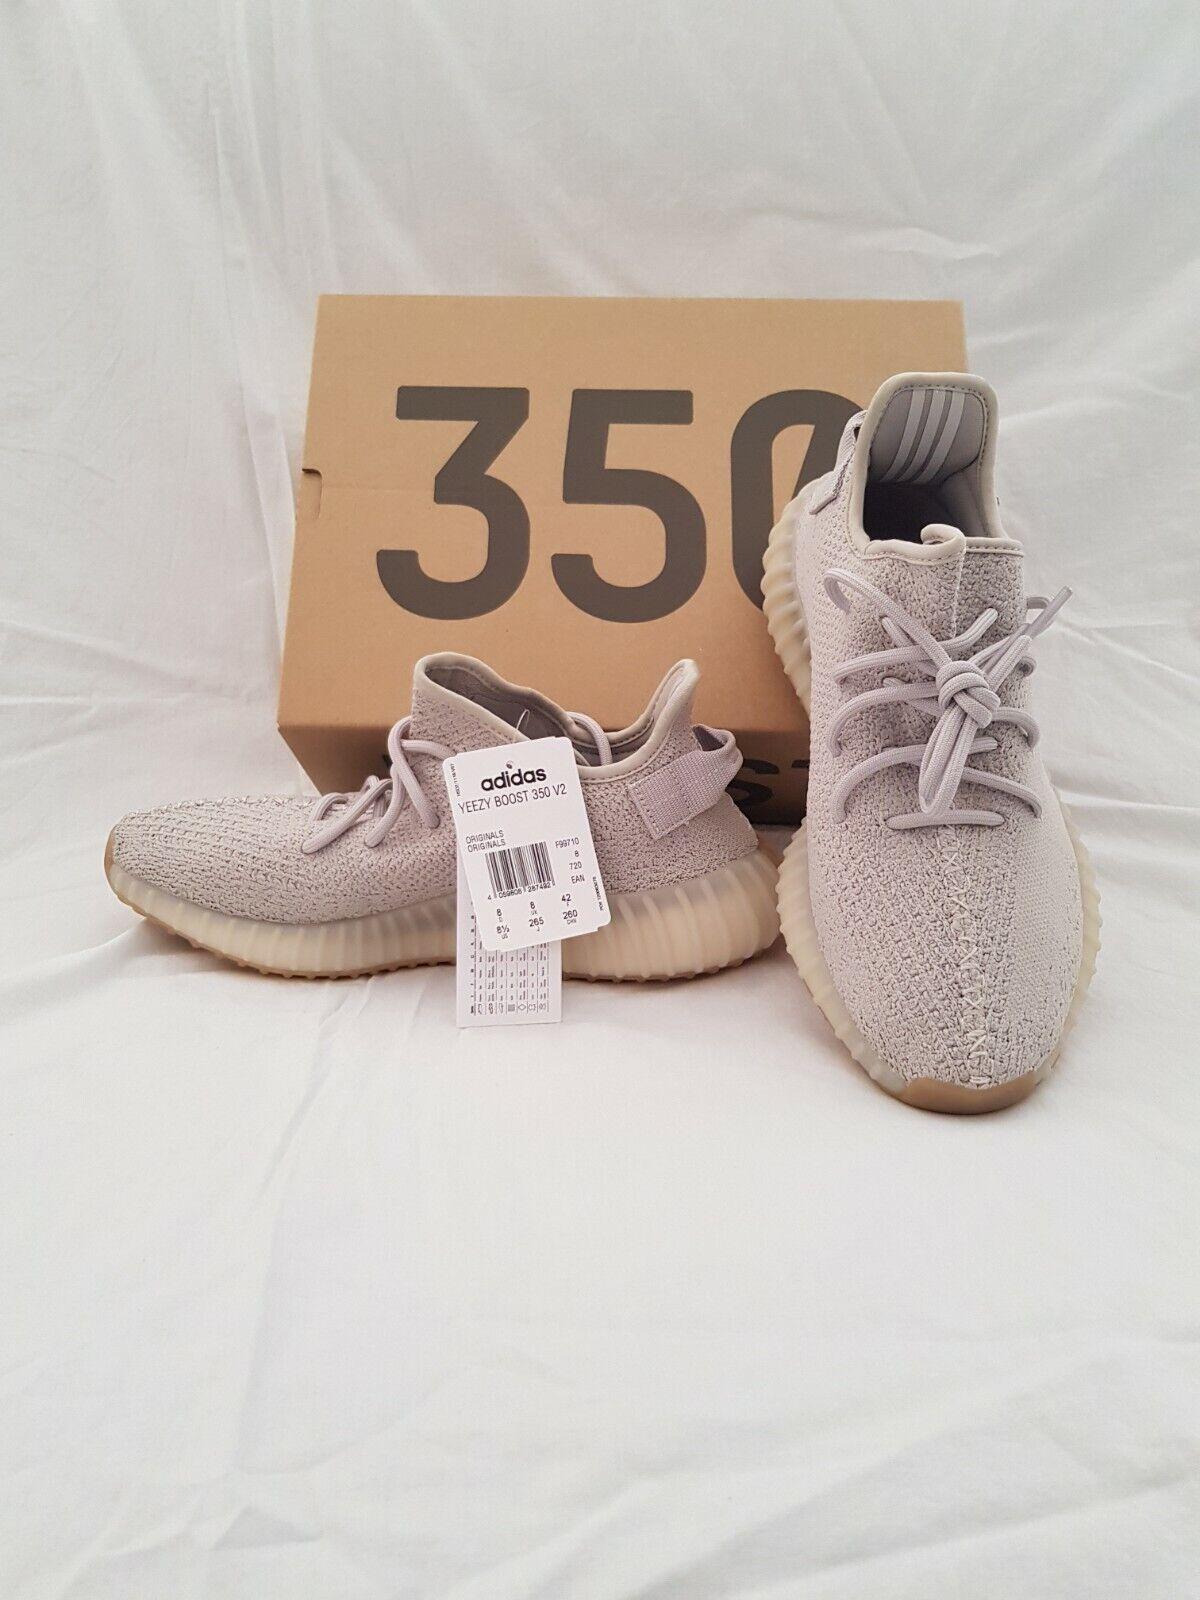 Adidas Yeezy Boost 350 Sesame Nuove US 8,5-EU 42 complete di scatola originale